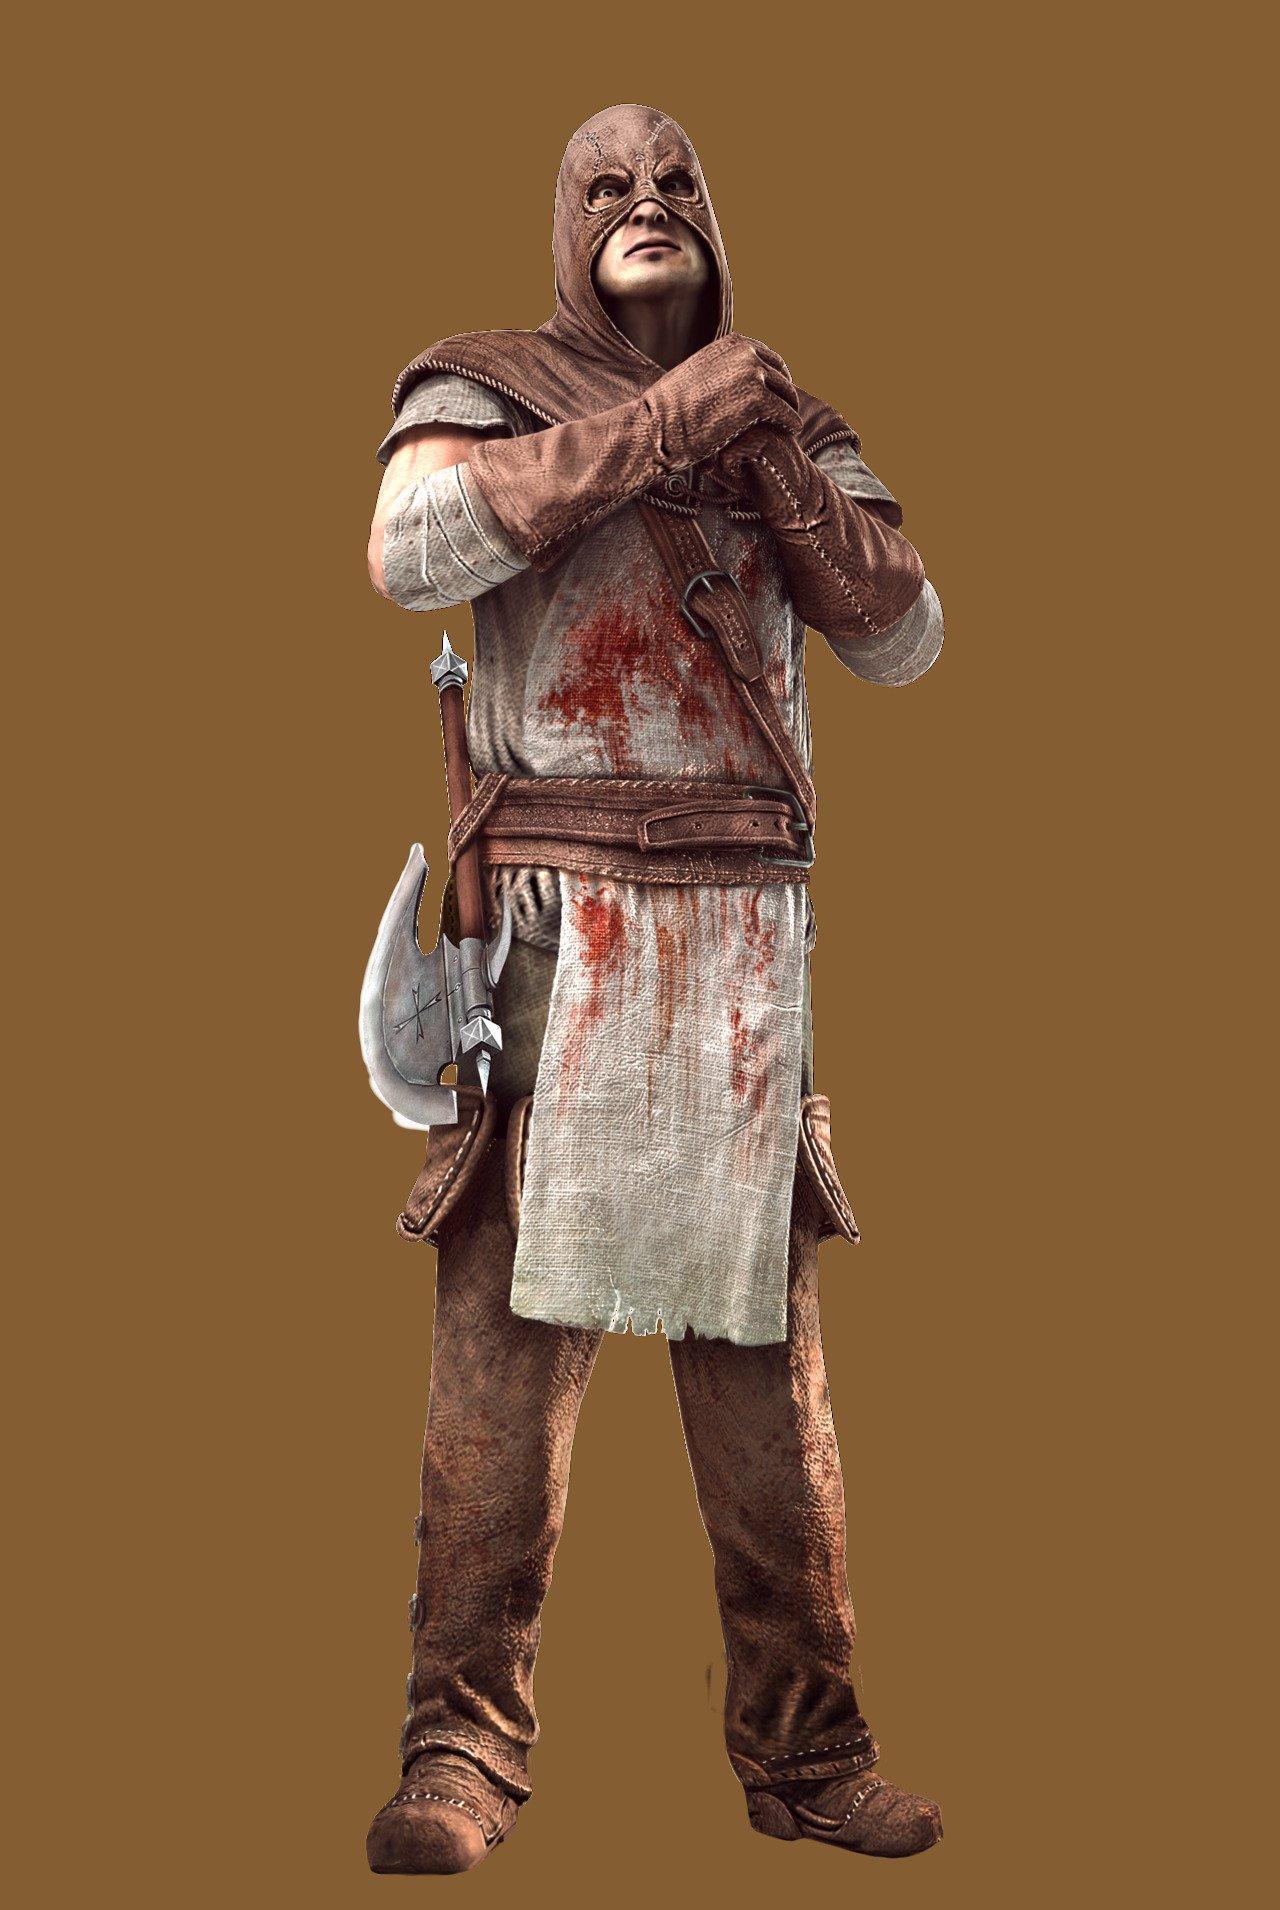 AssassinsCreedBrotherhood Visuel007